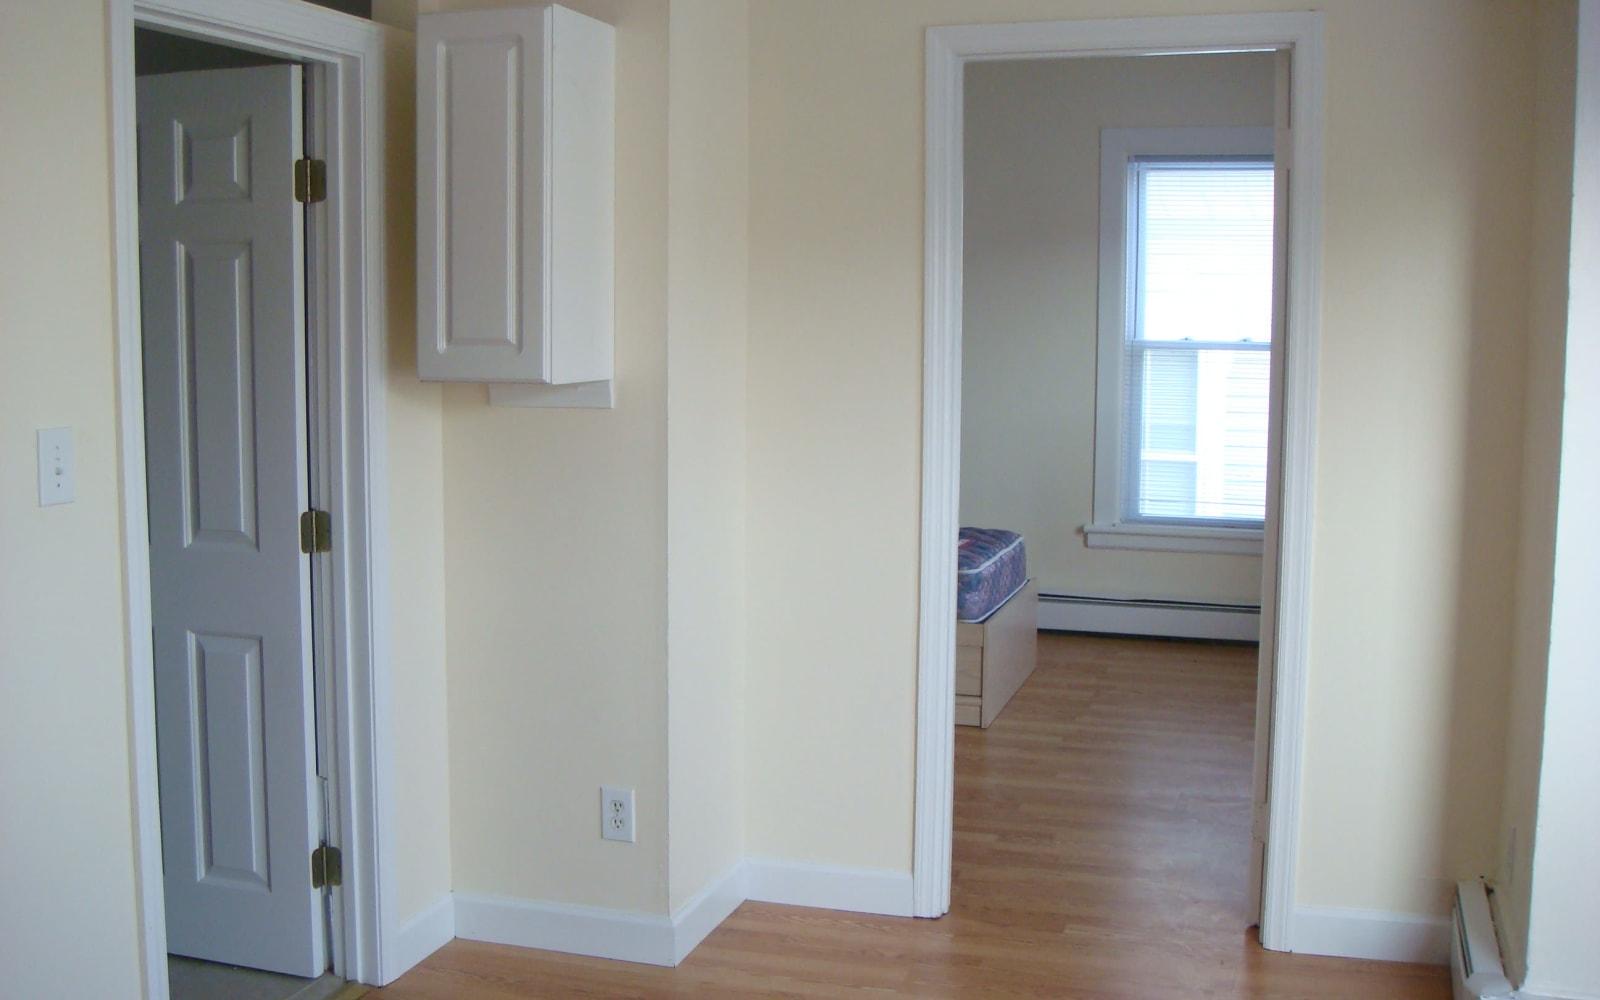 Entry into bedrooms at 400 Atlantic in Bridgeport, Connecticut